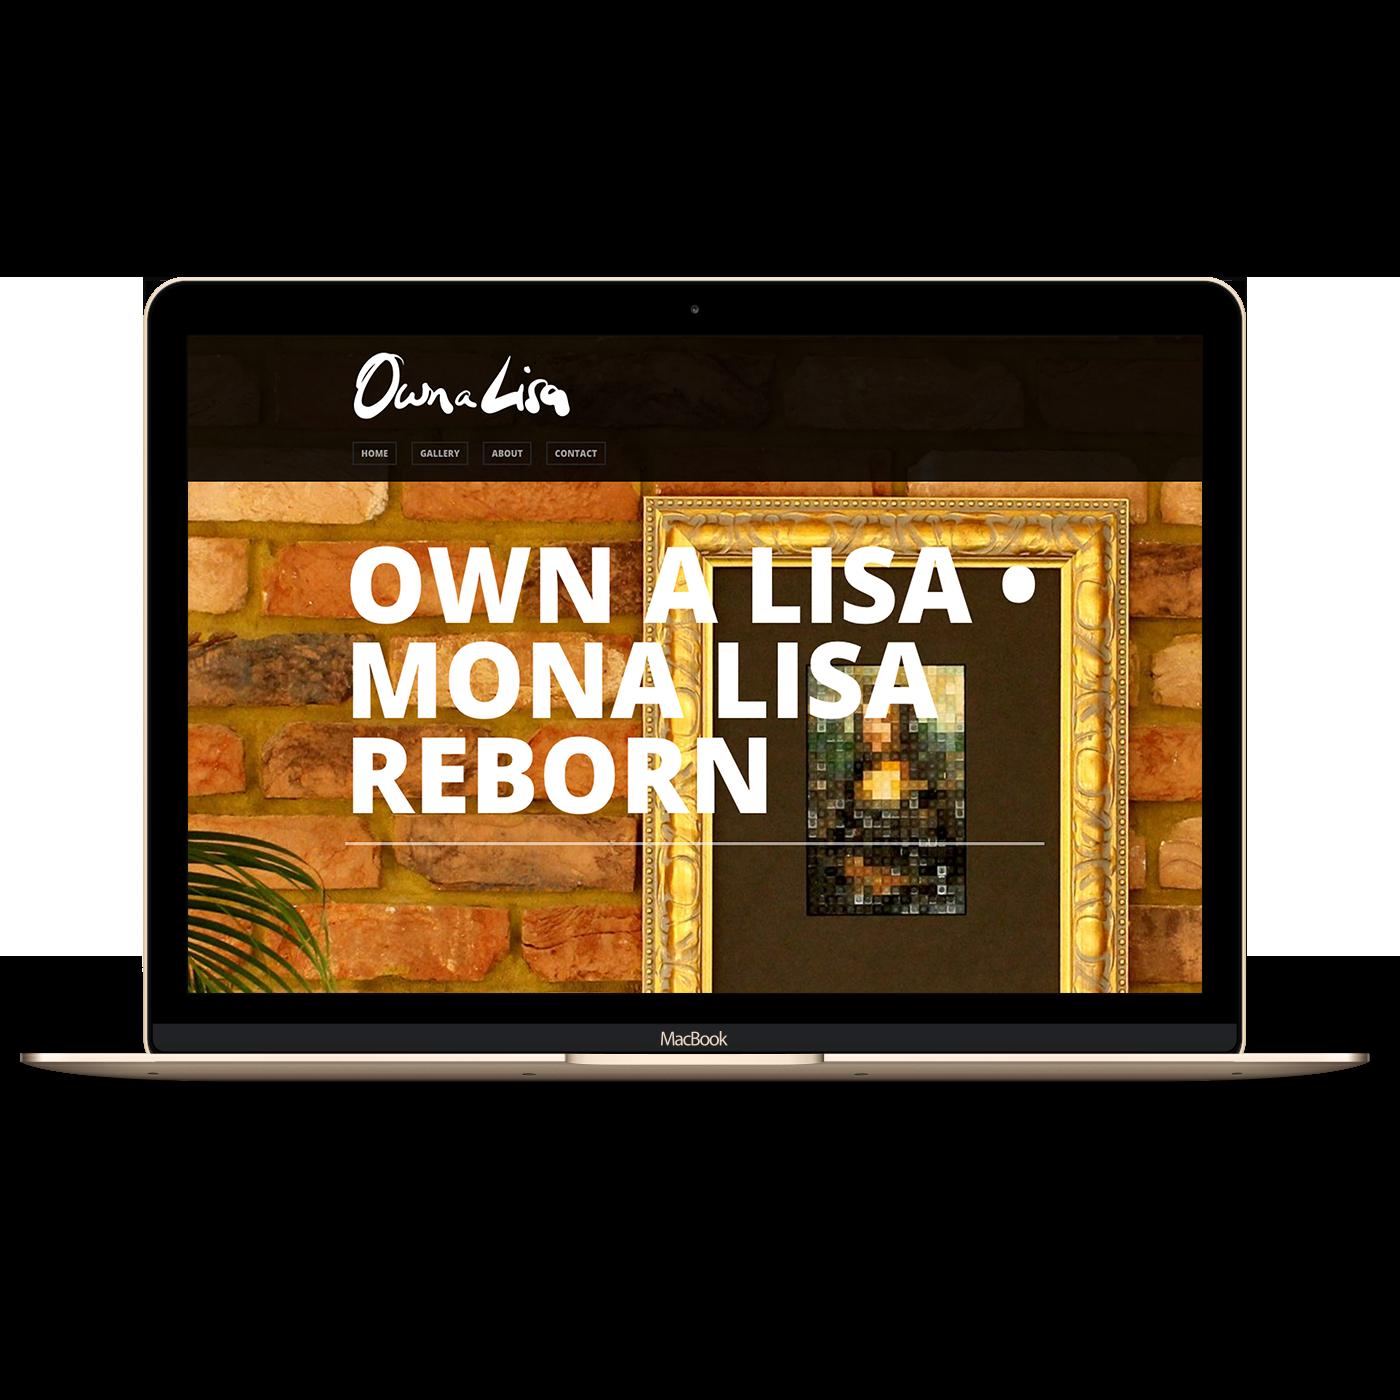 Own A Lisa Website image